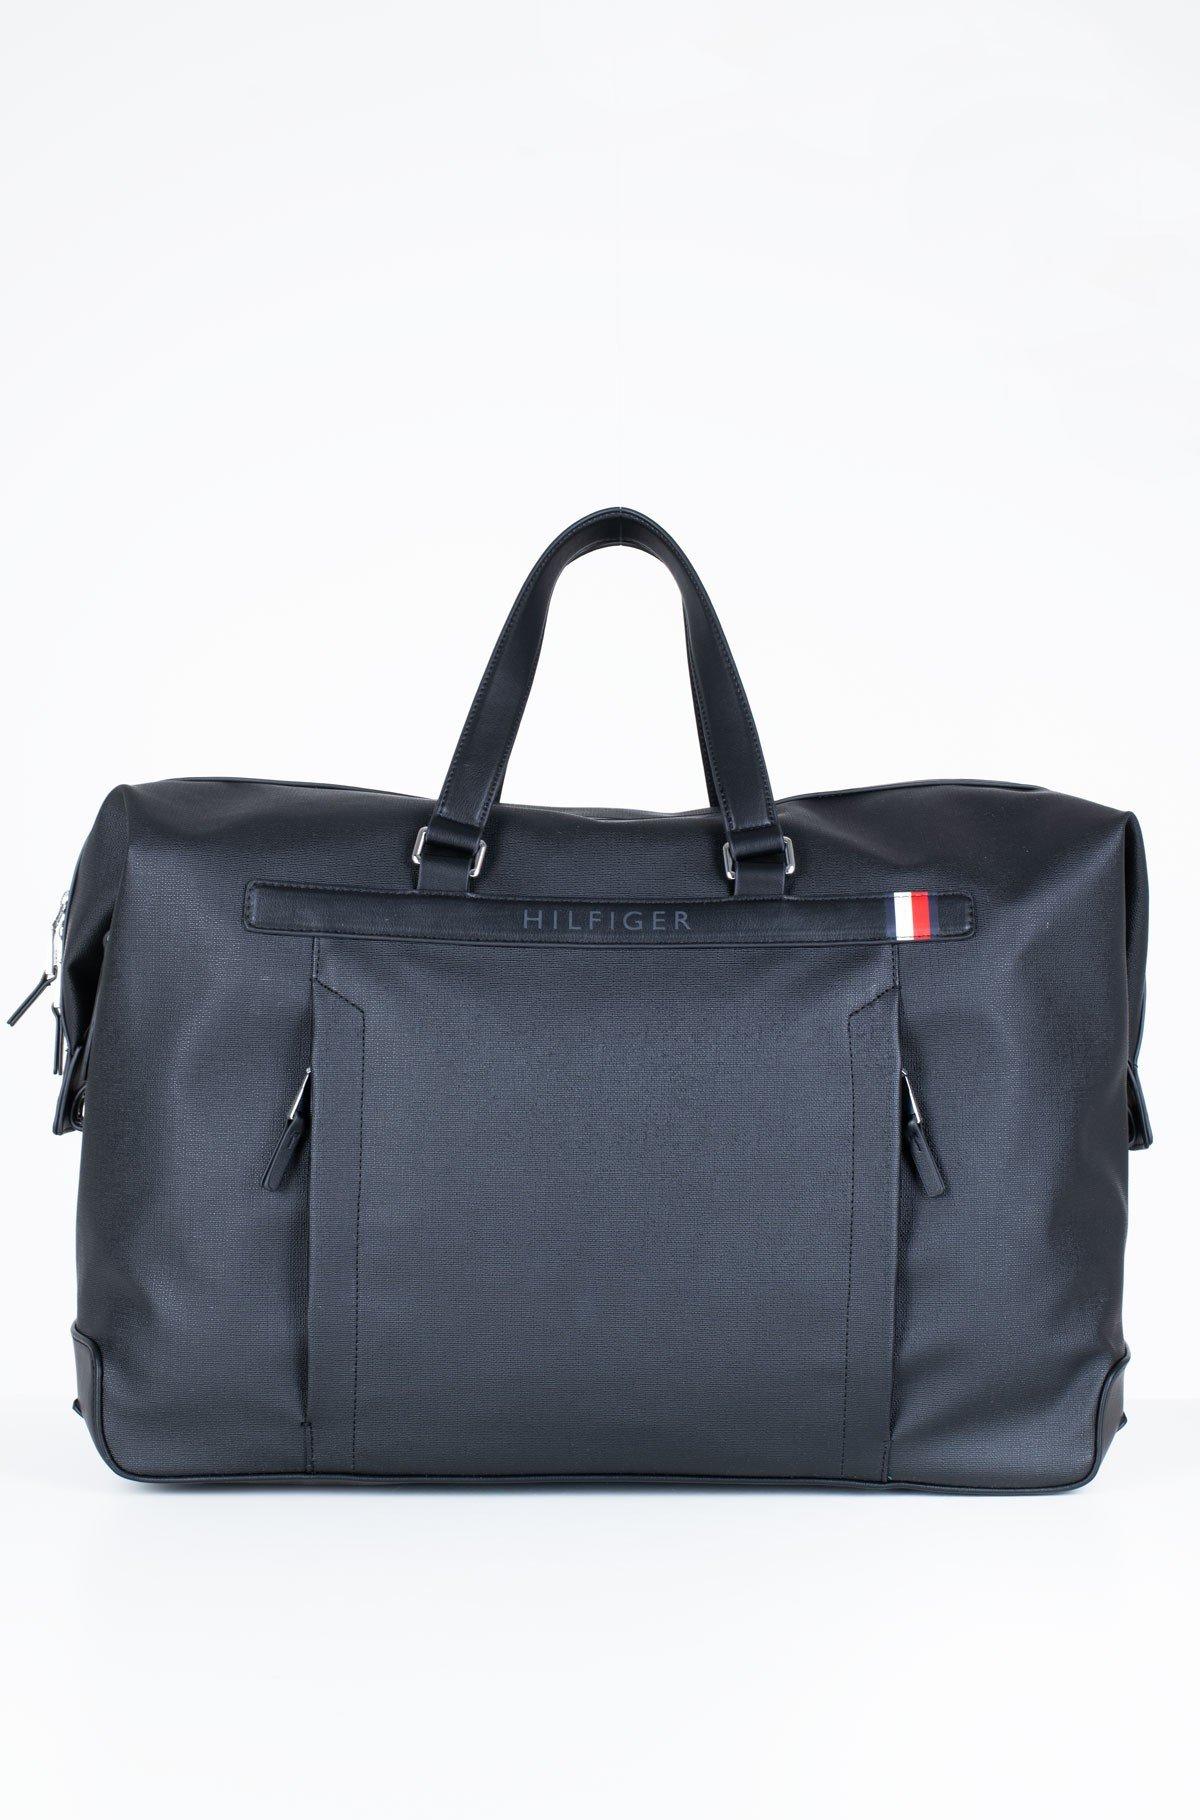 Kelionių krepšys COATED CANVAS DUFFLE-full-1